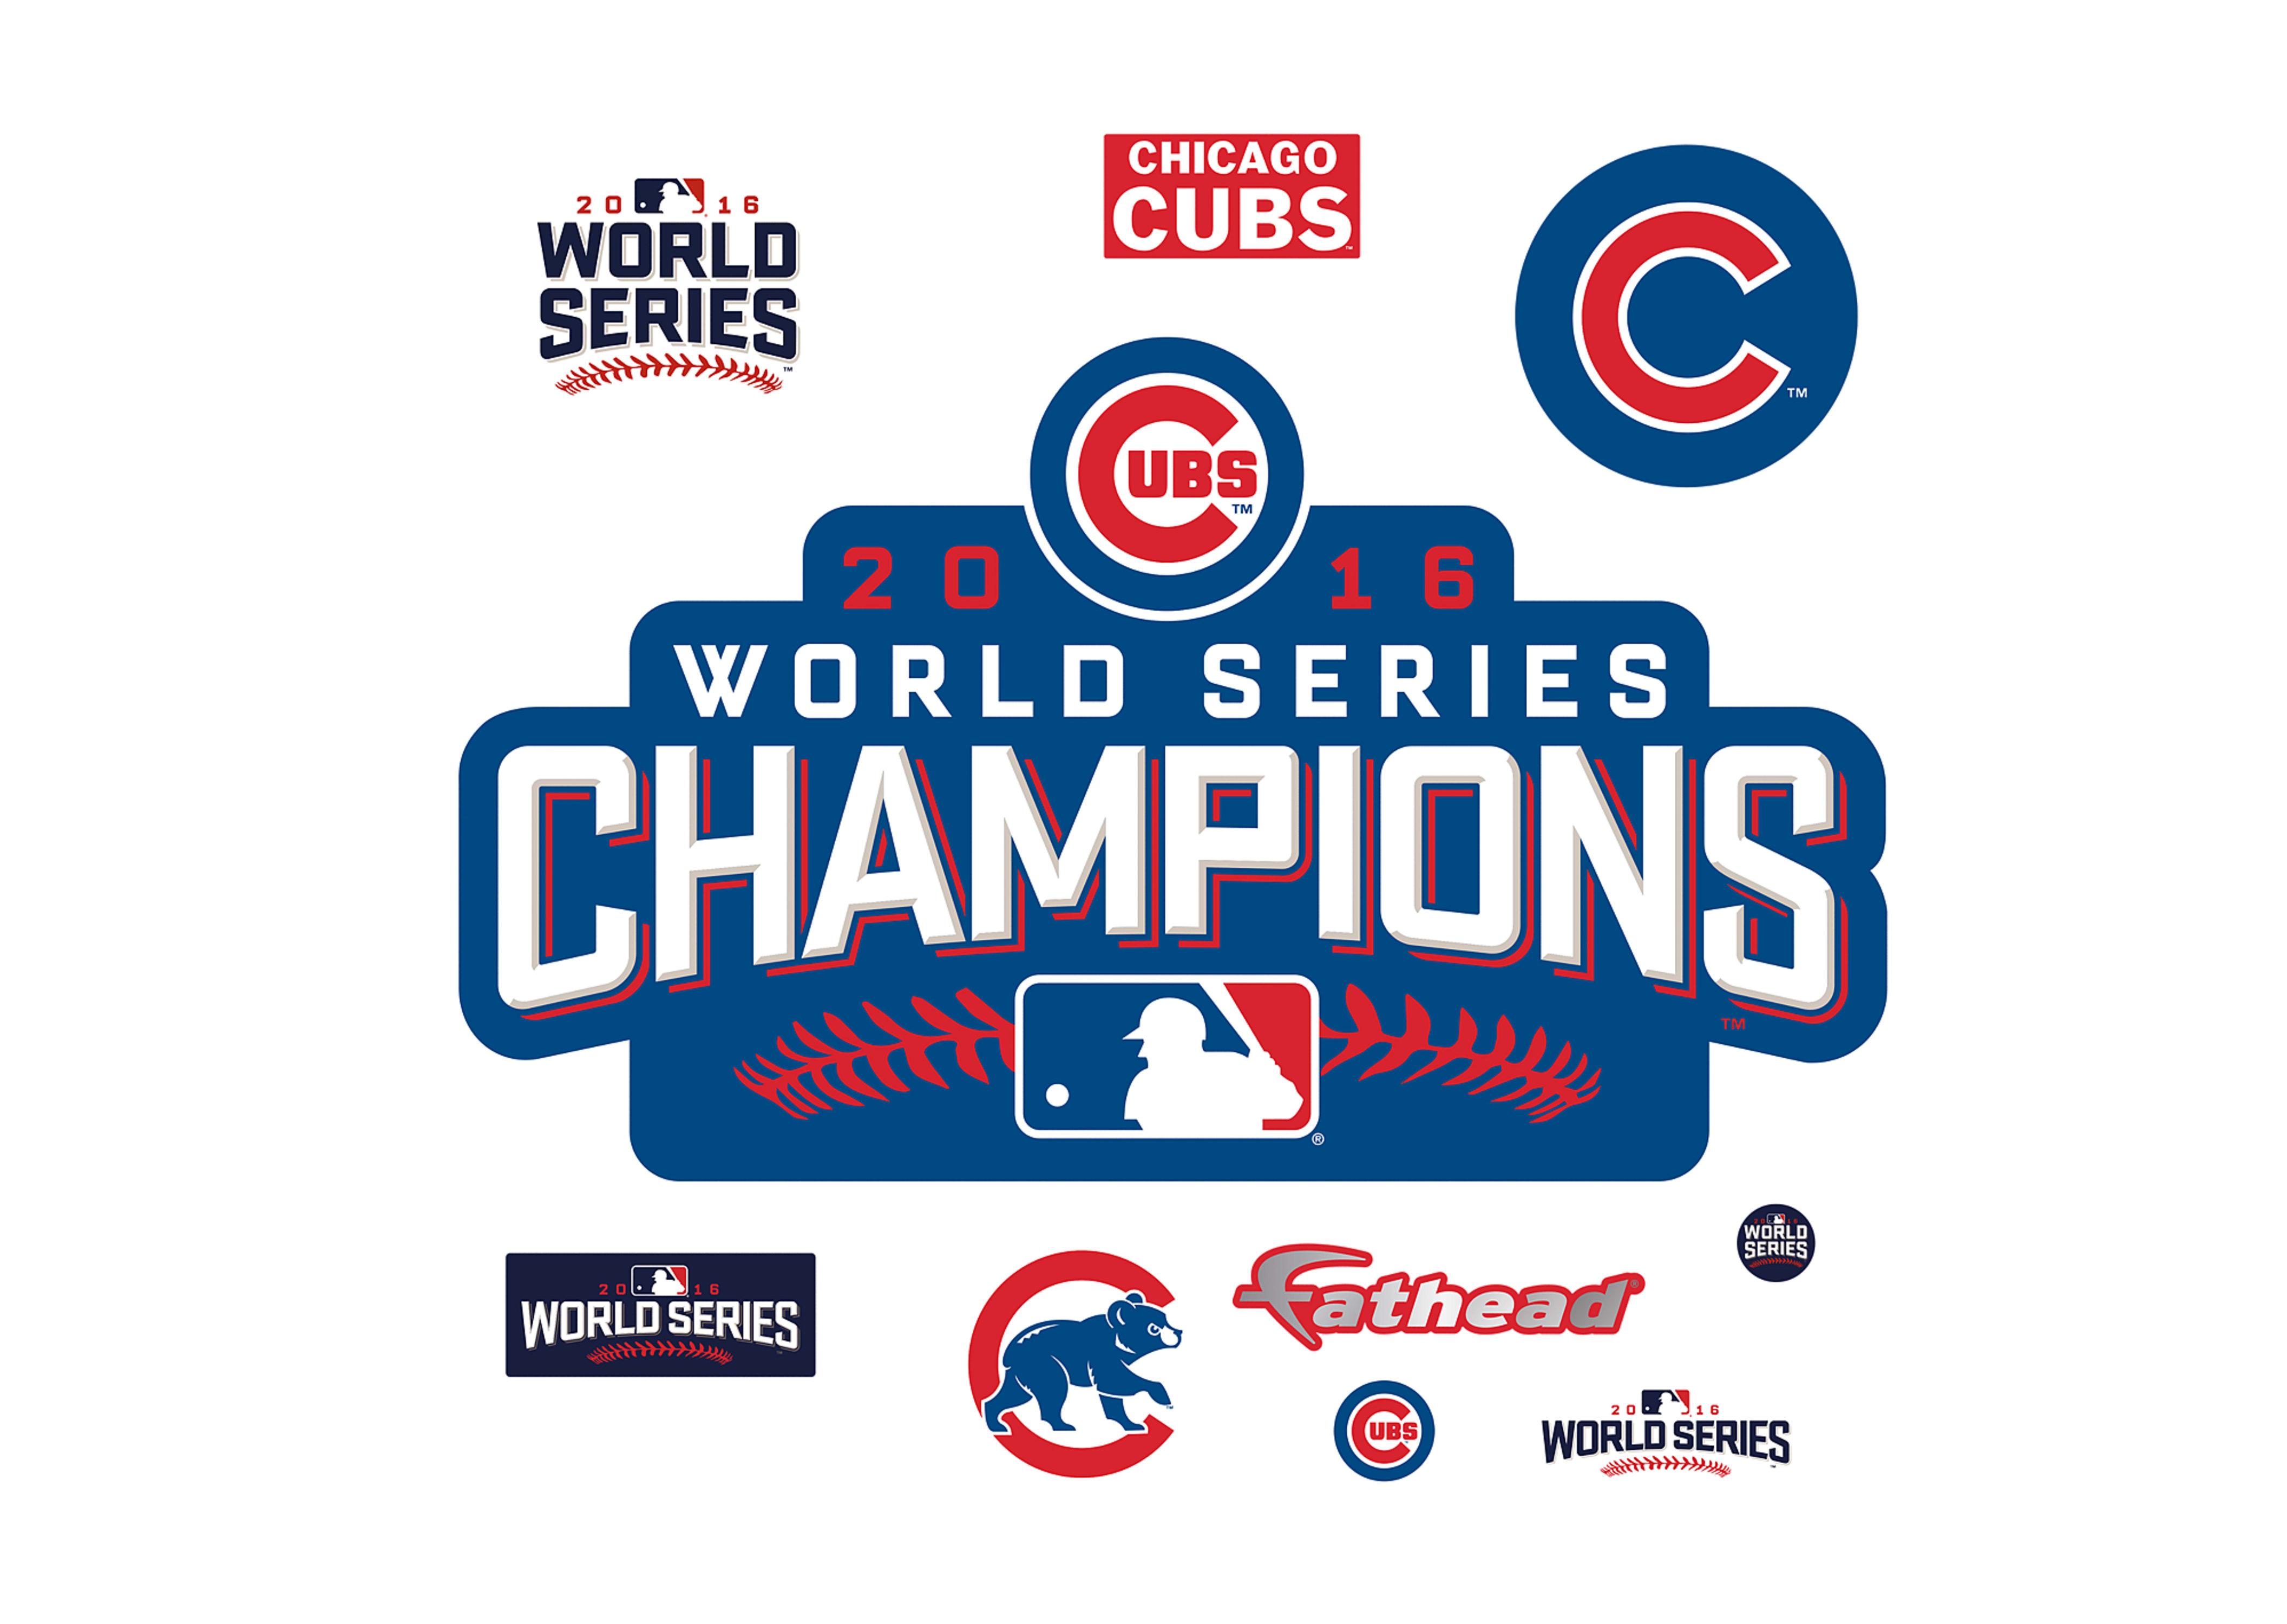 Chicago cubs world series Logos.